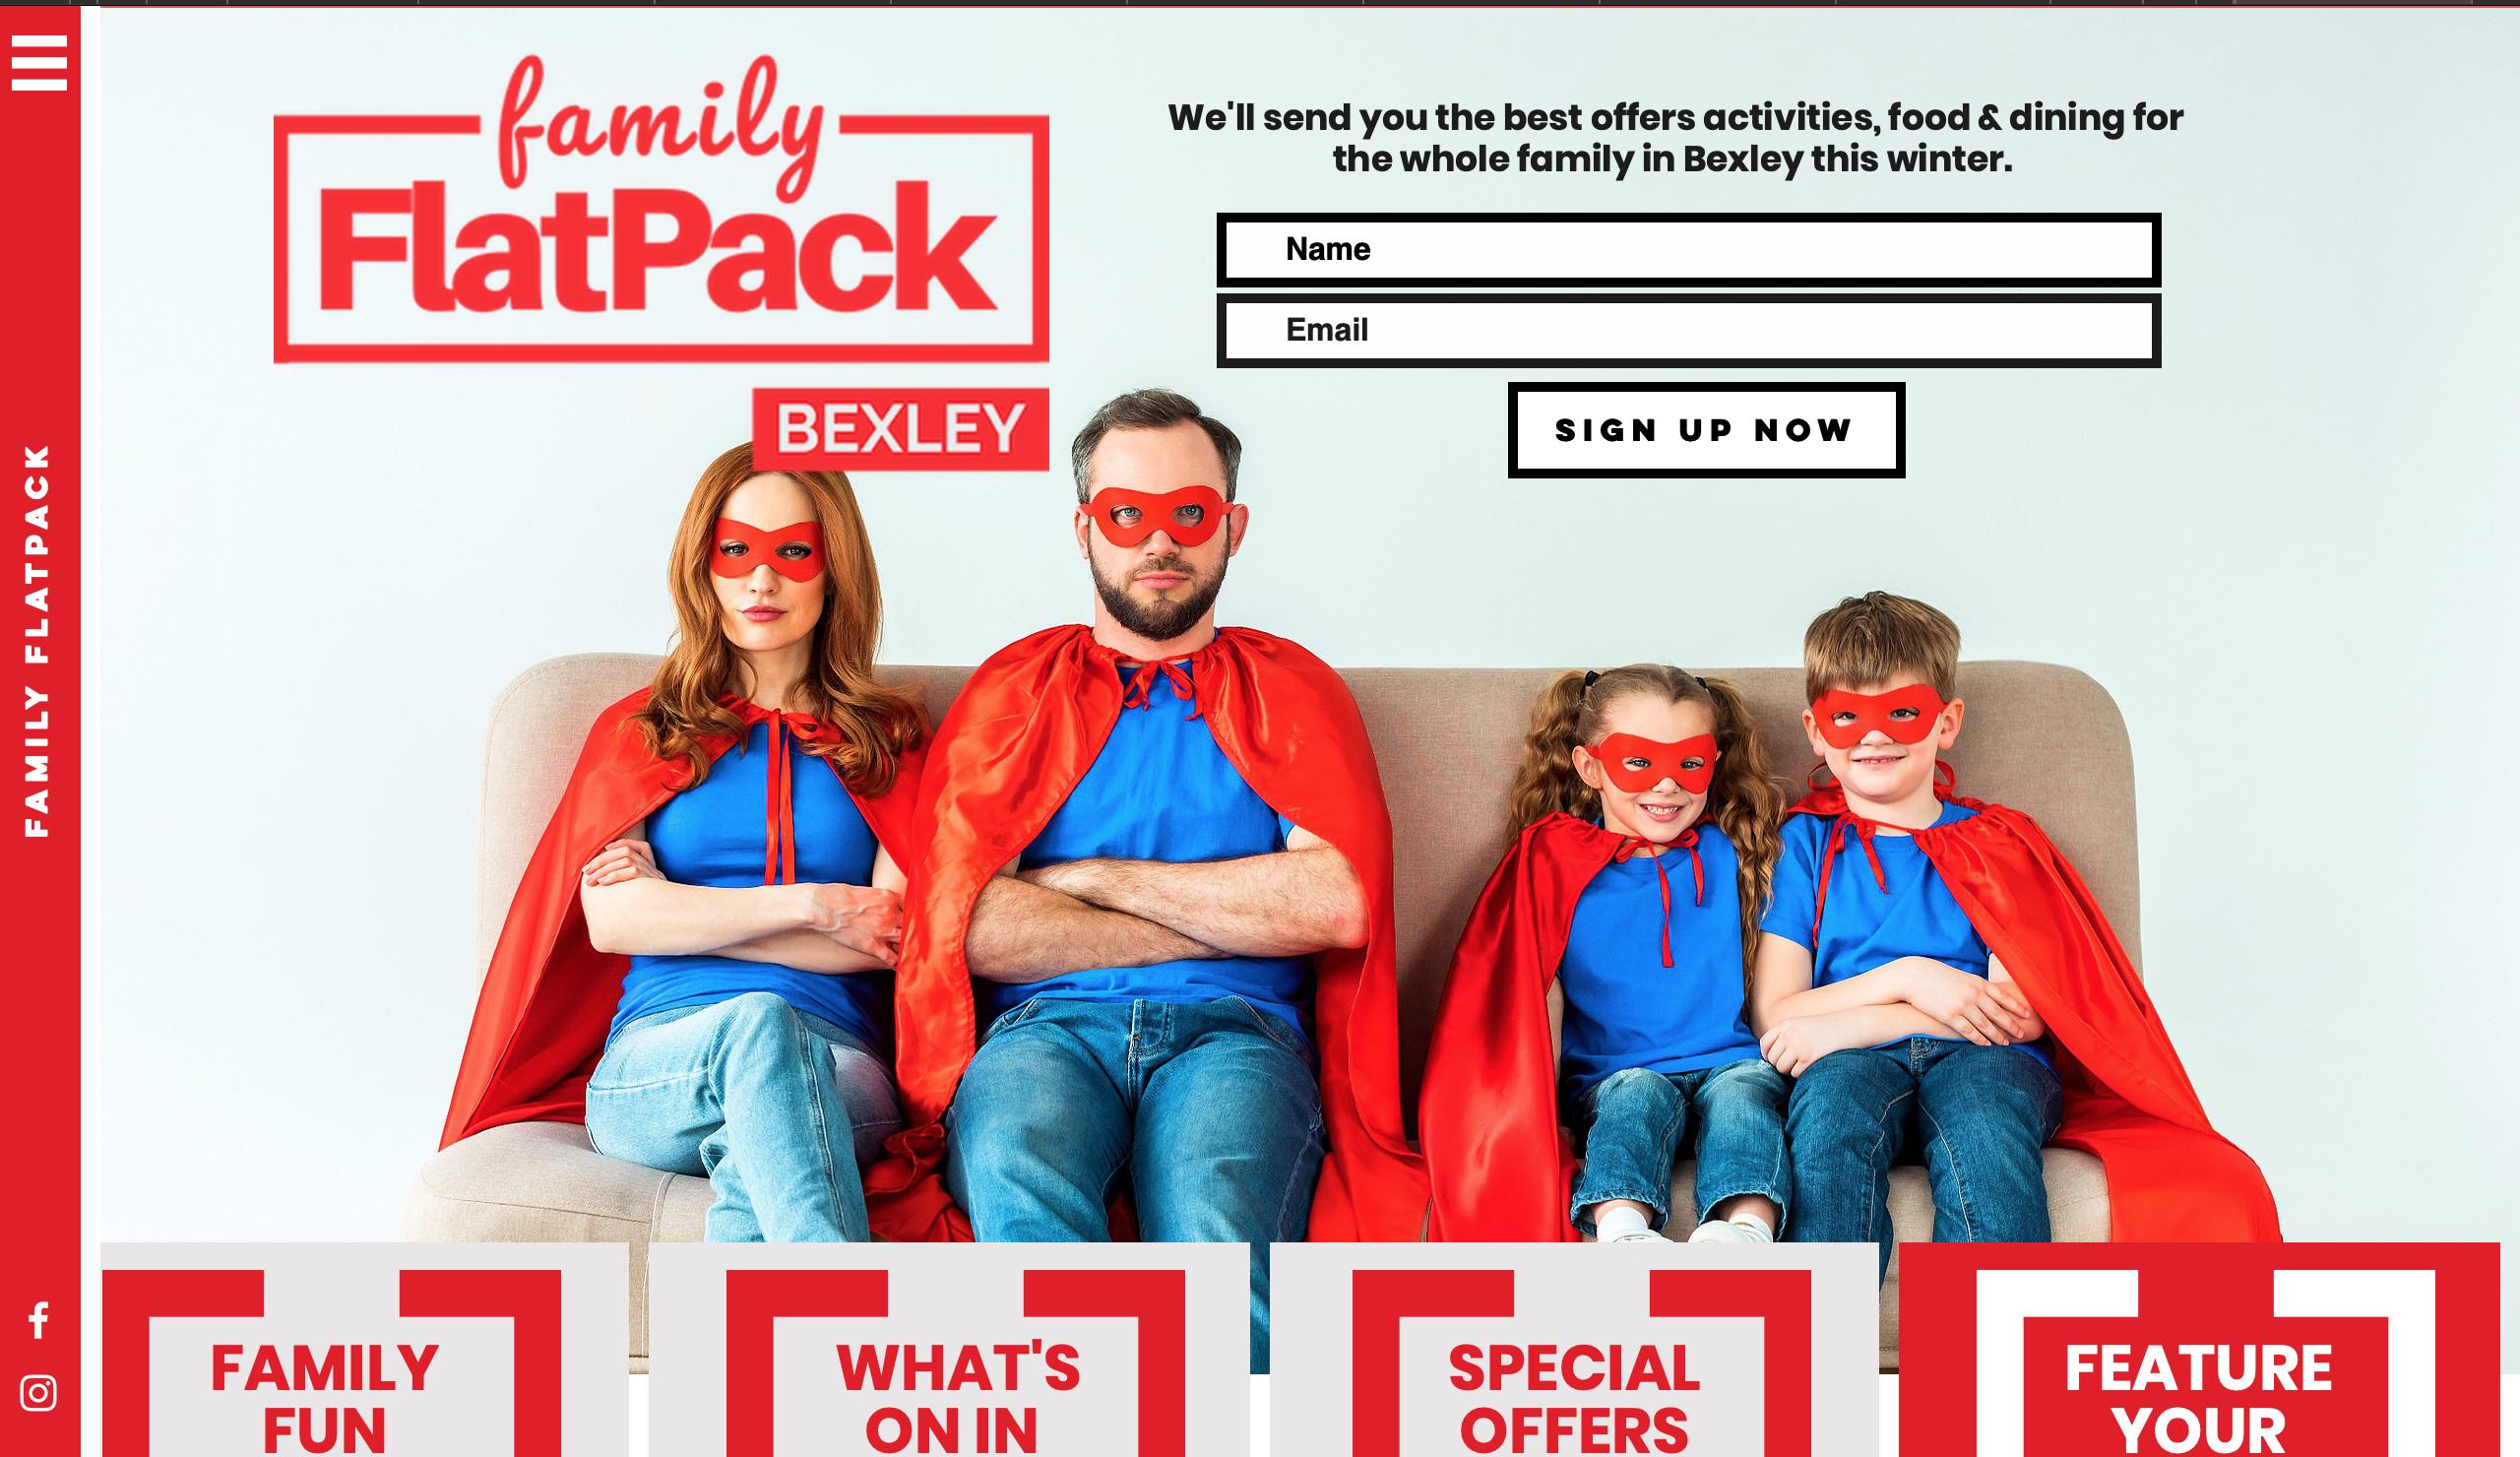 Website | Family FlatPack